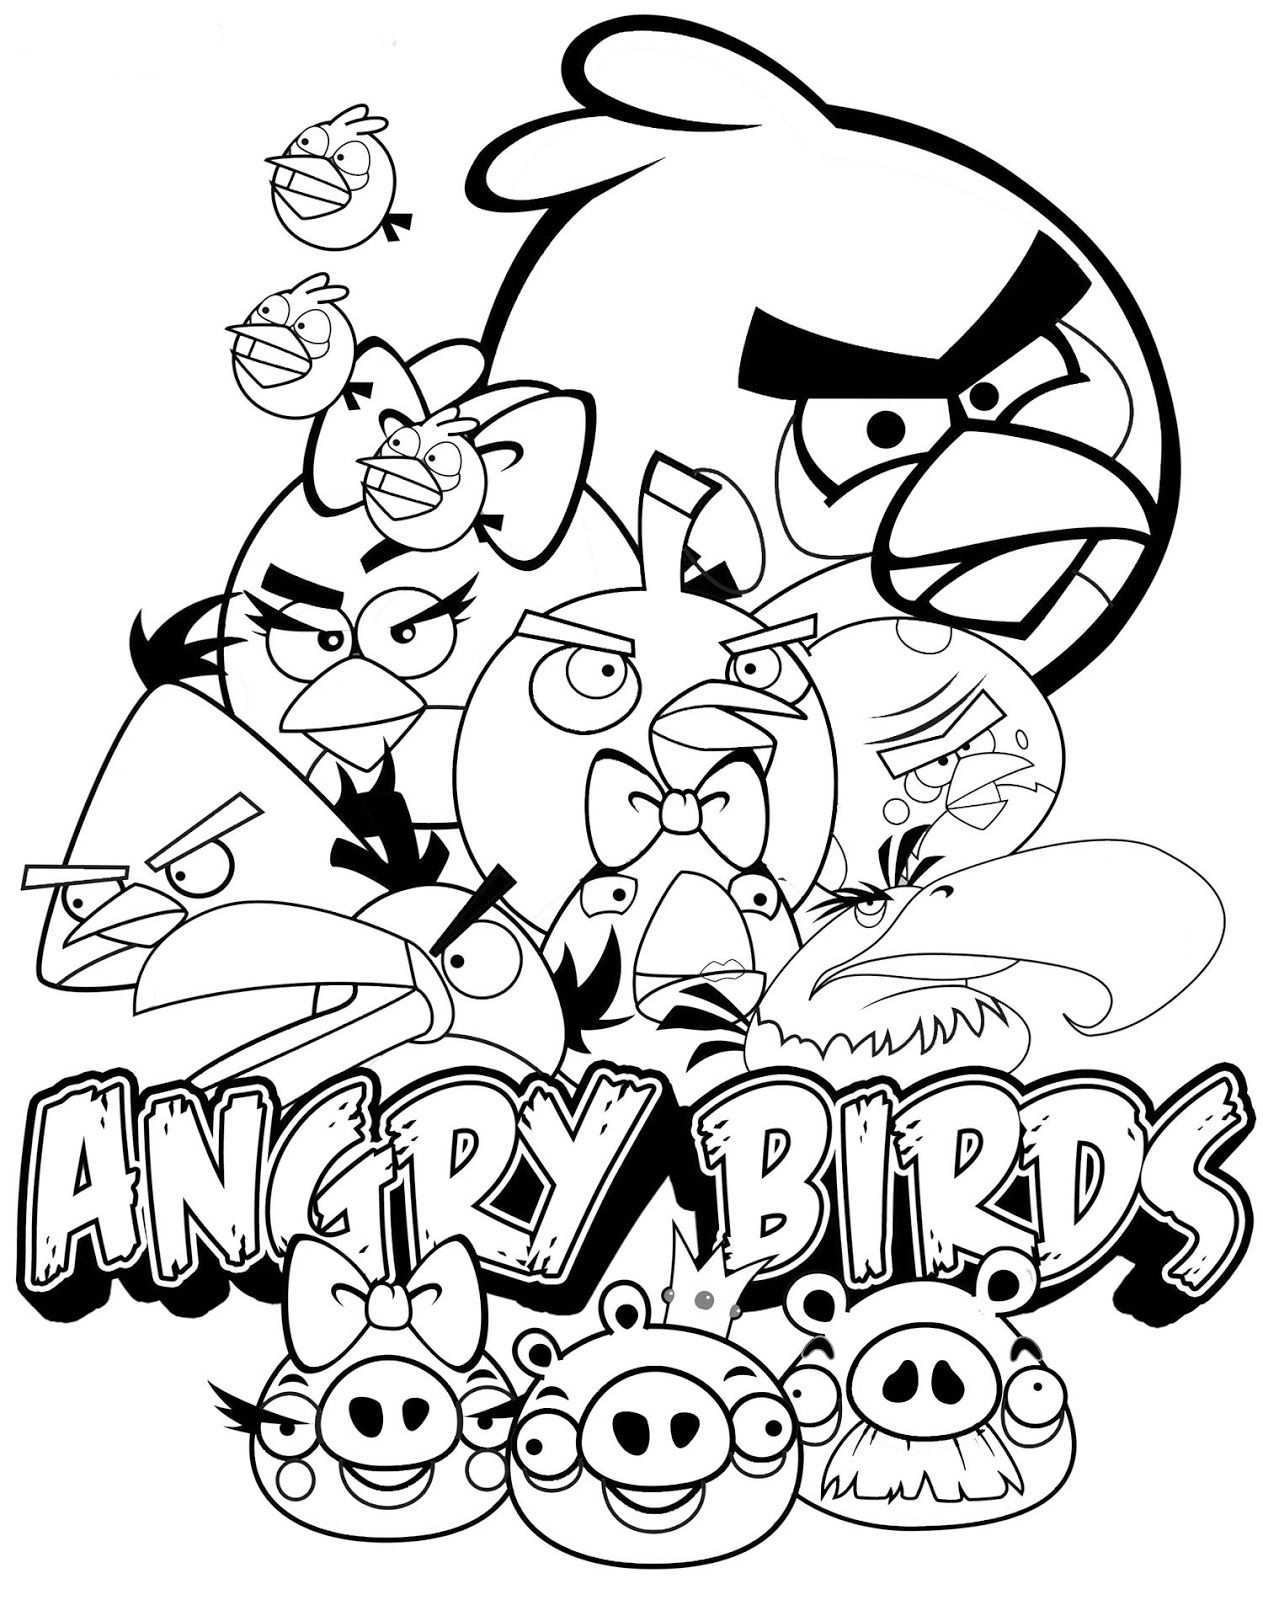 Angry Birds Kleurplaten Poster Bird Coloring Pages Coloring Pages Coloring Pages For Kids